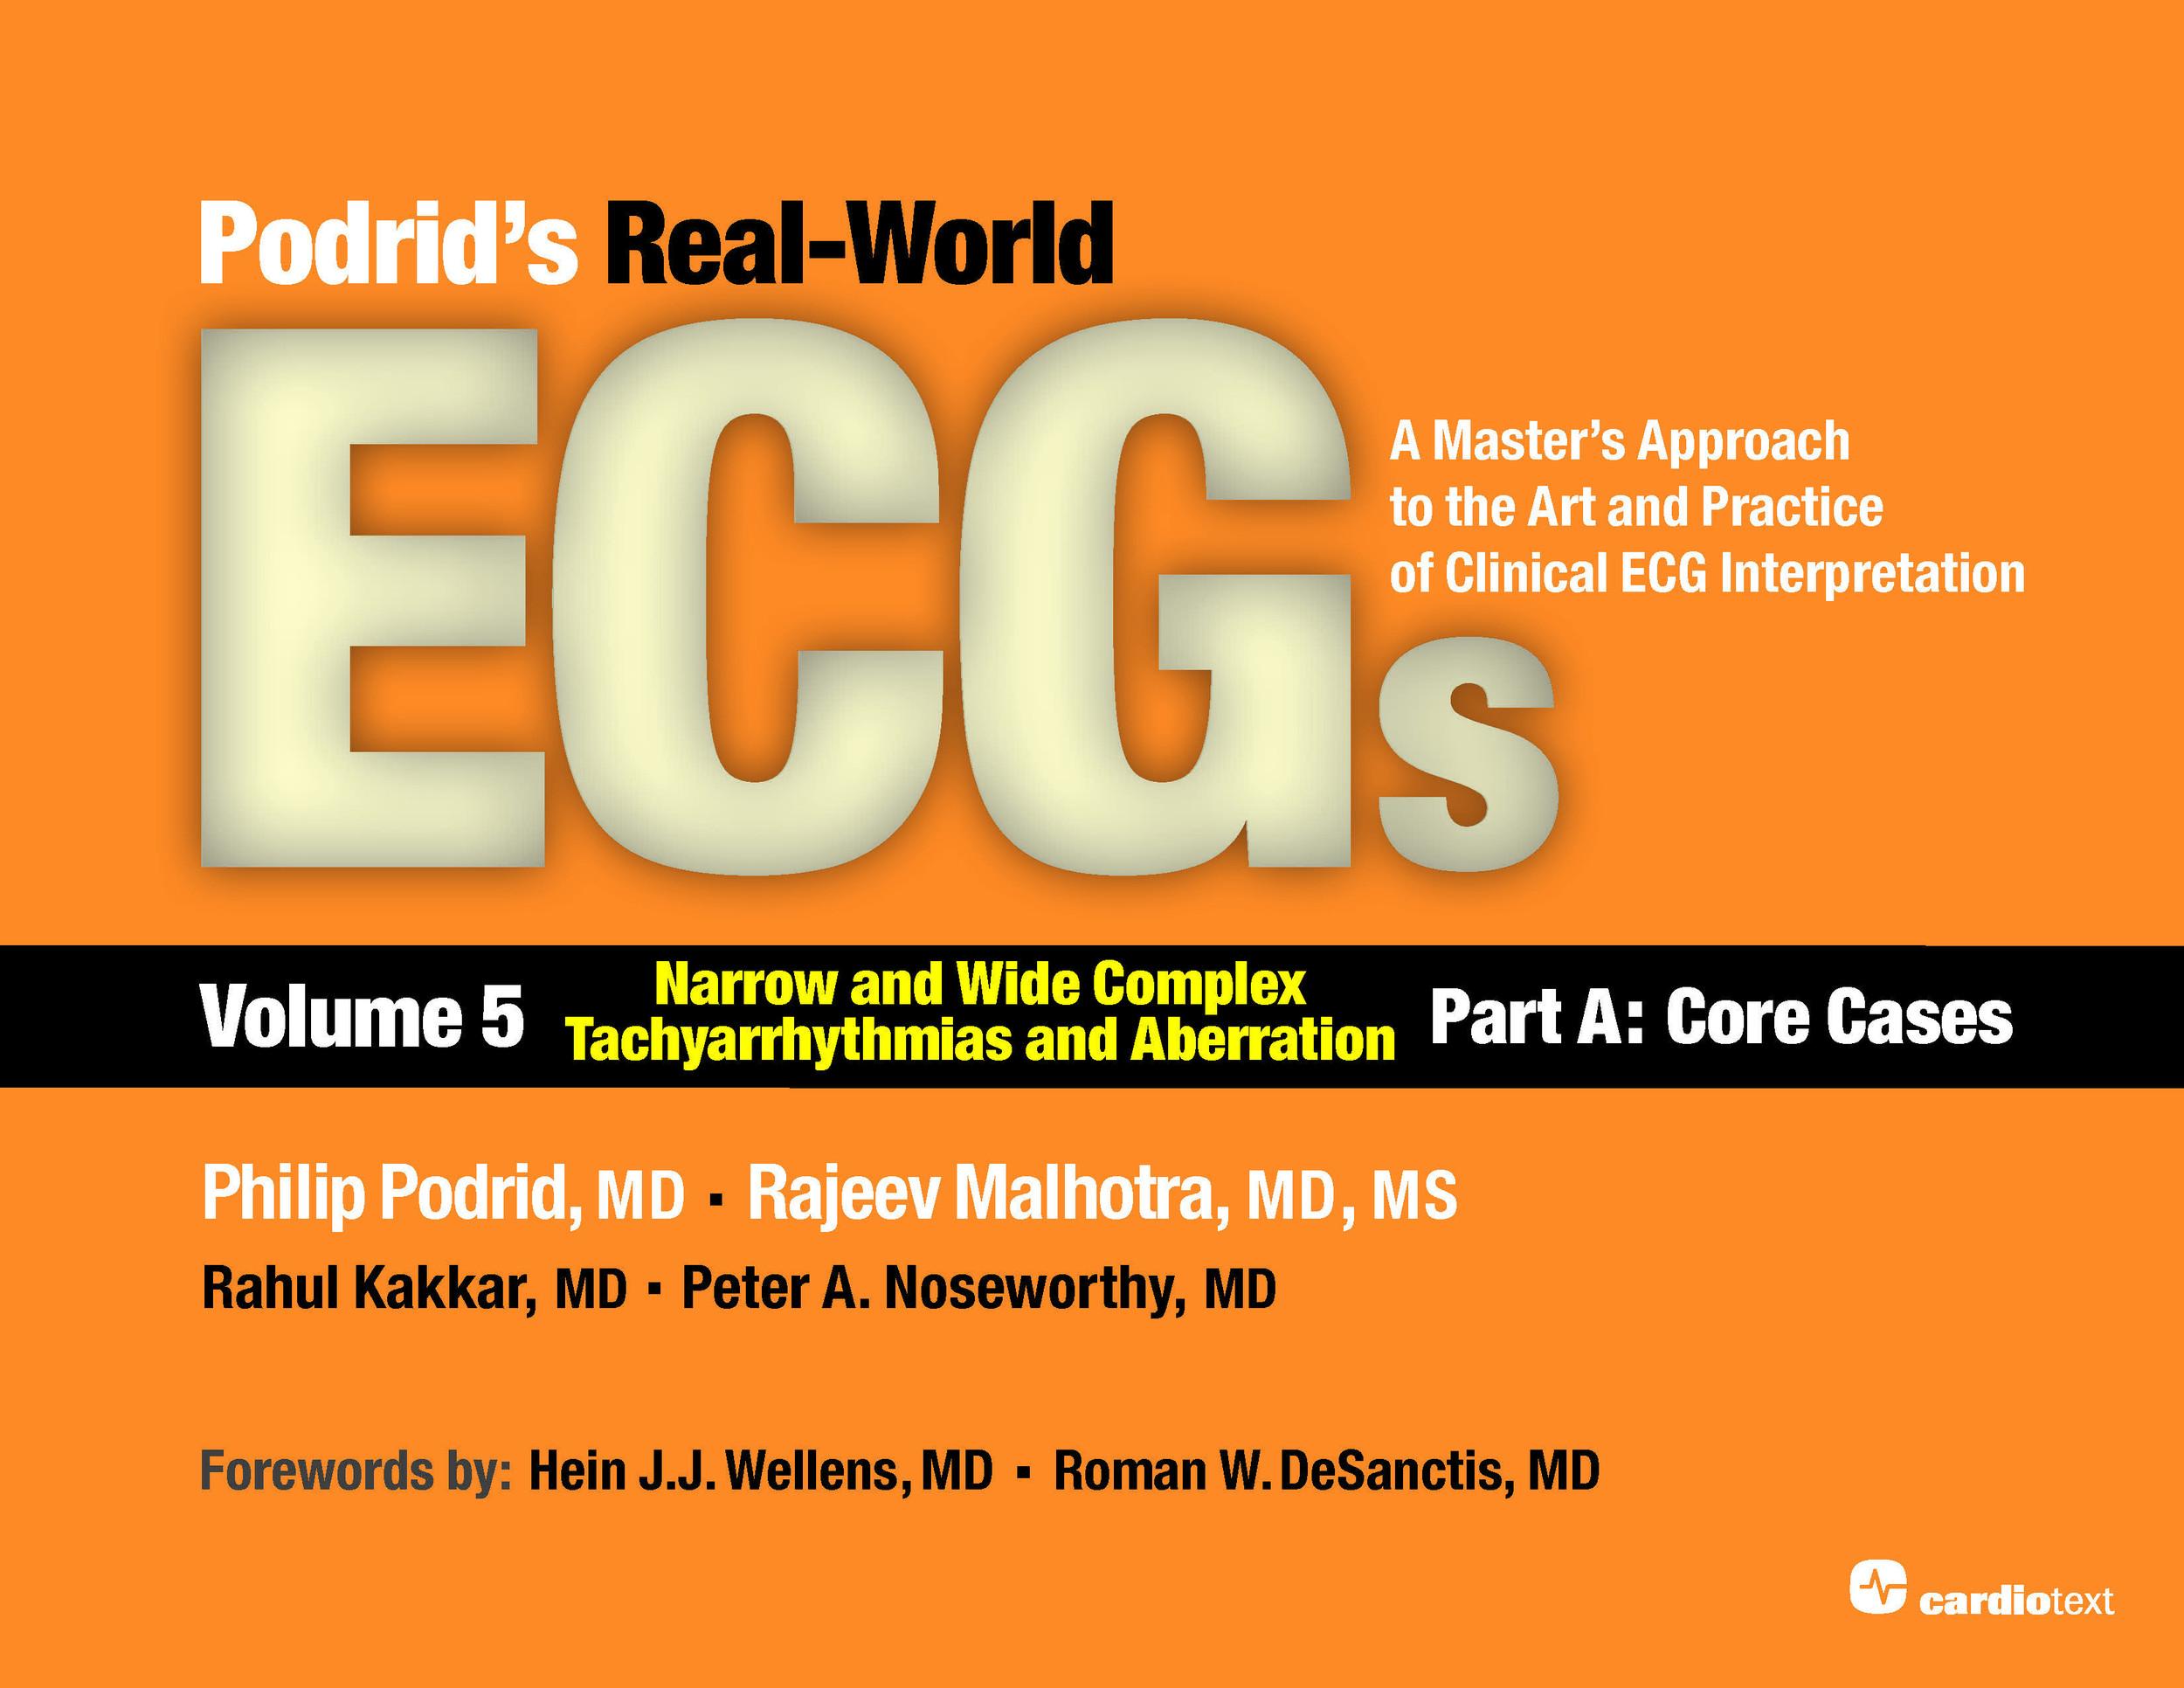 Podrid's Real-World ECGs Volume 5A